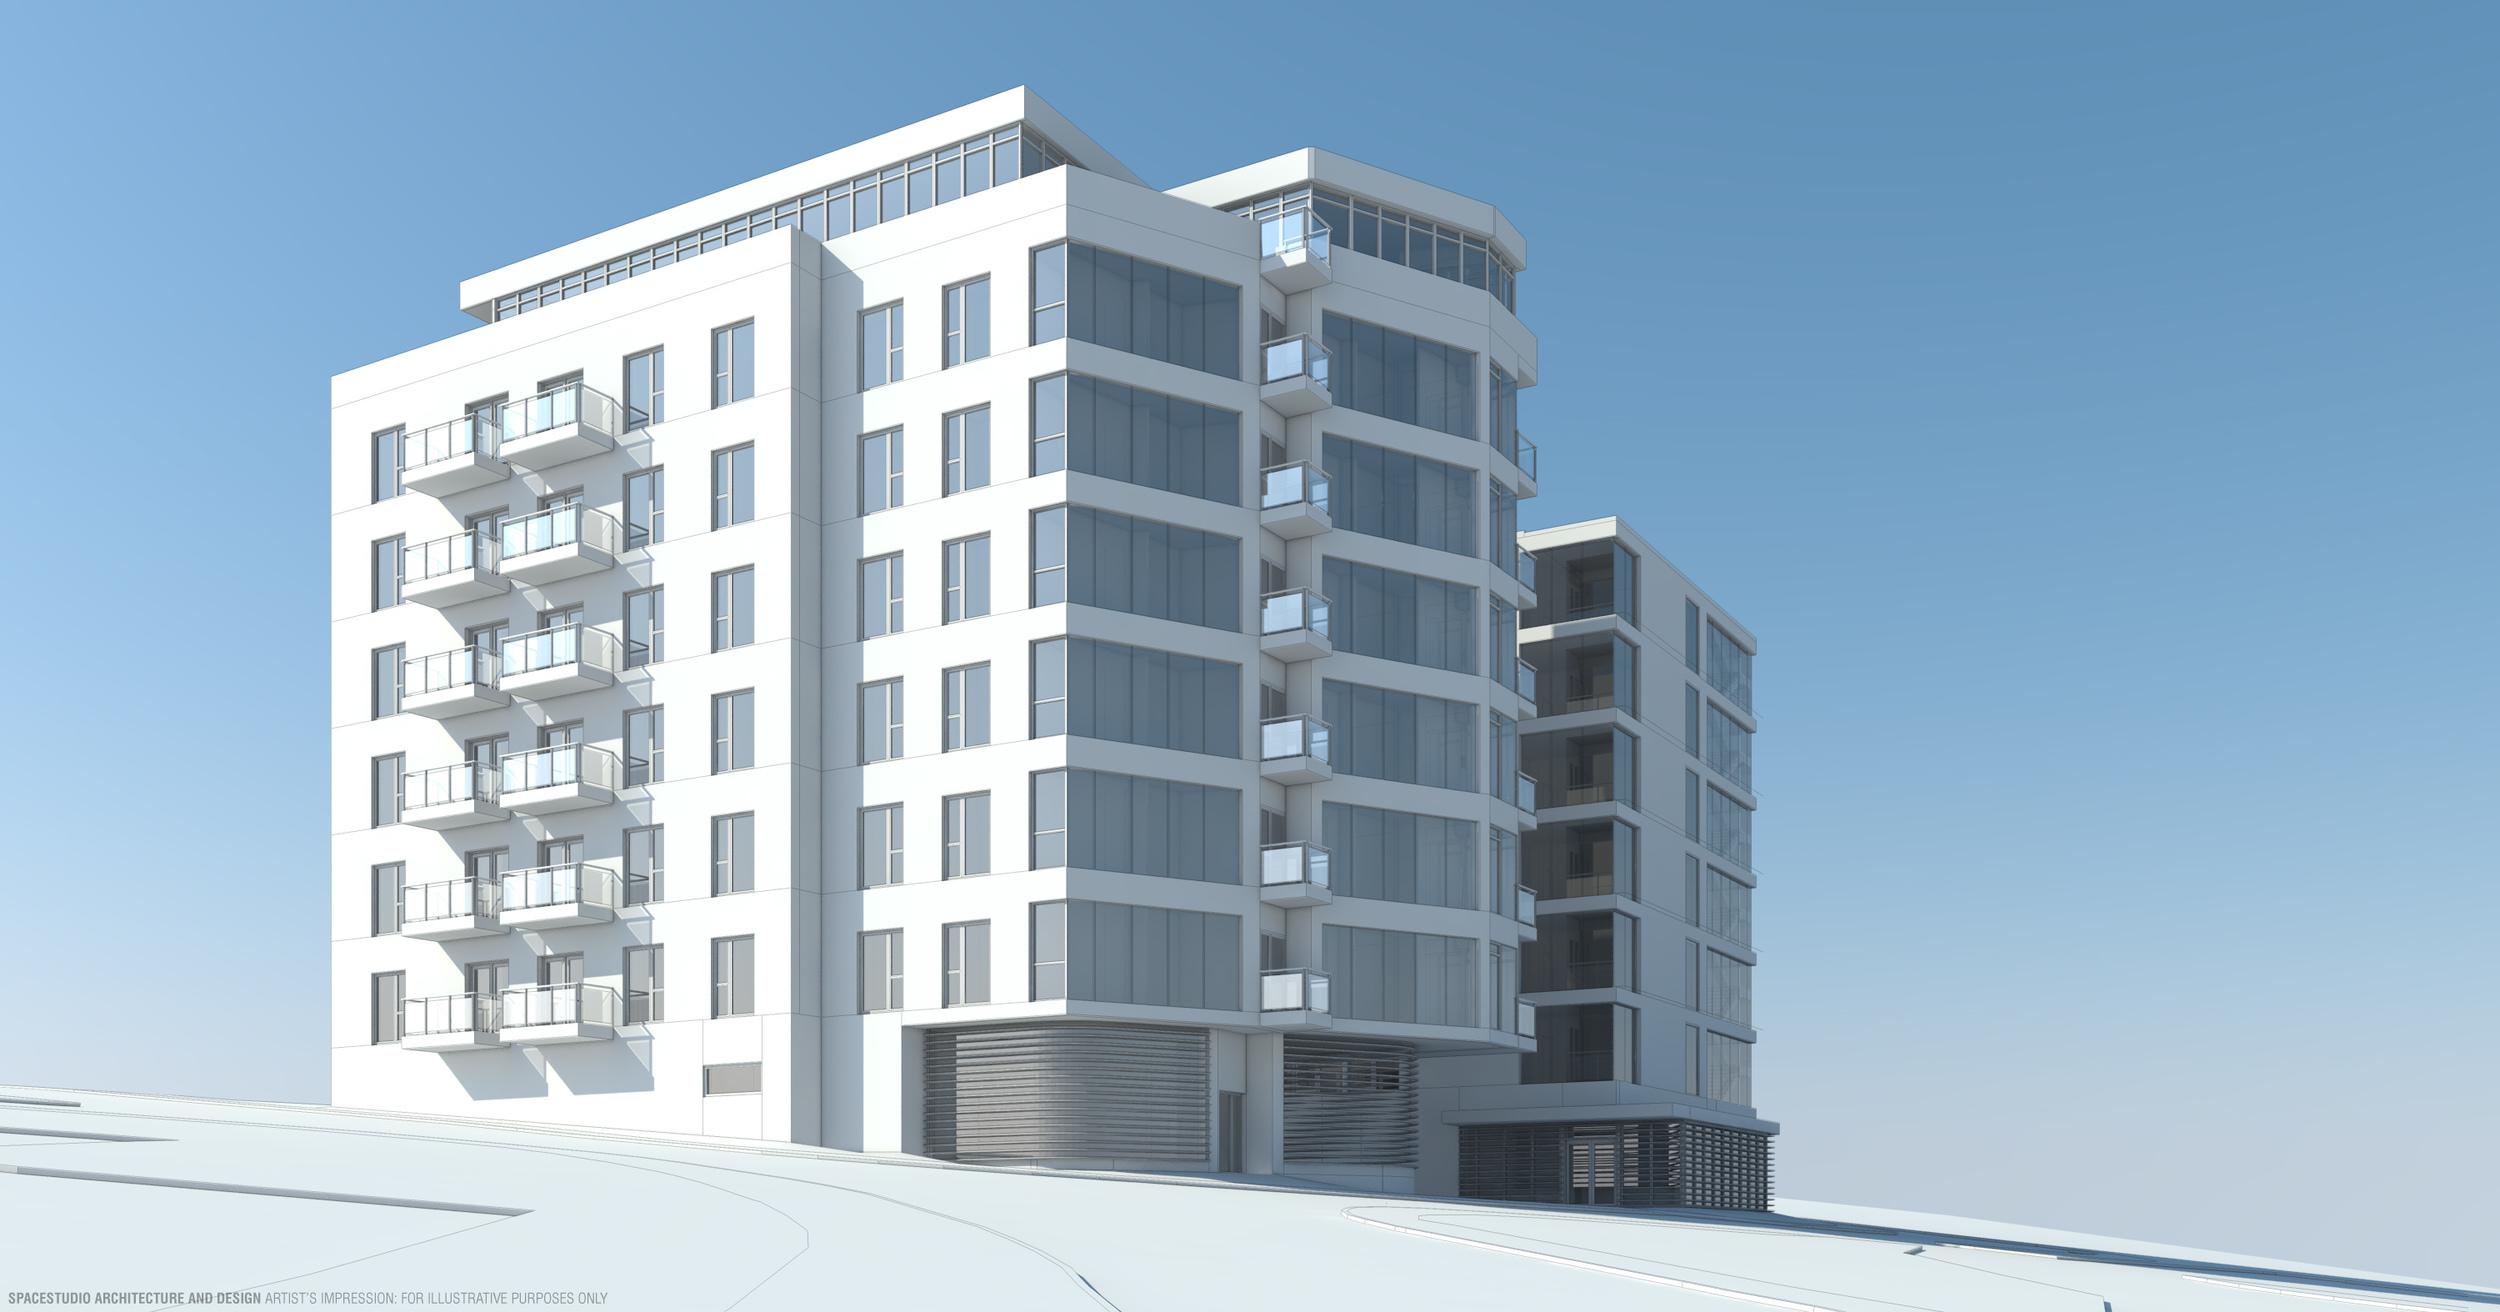 Spacestudio_Sheffield-Architects-BasilCloseChesterf-01.jpg